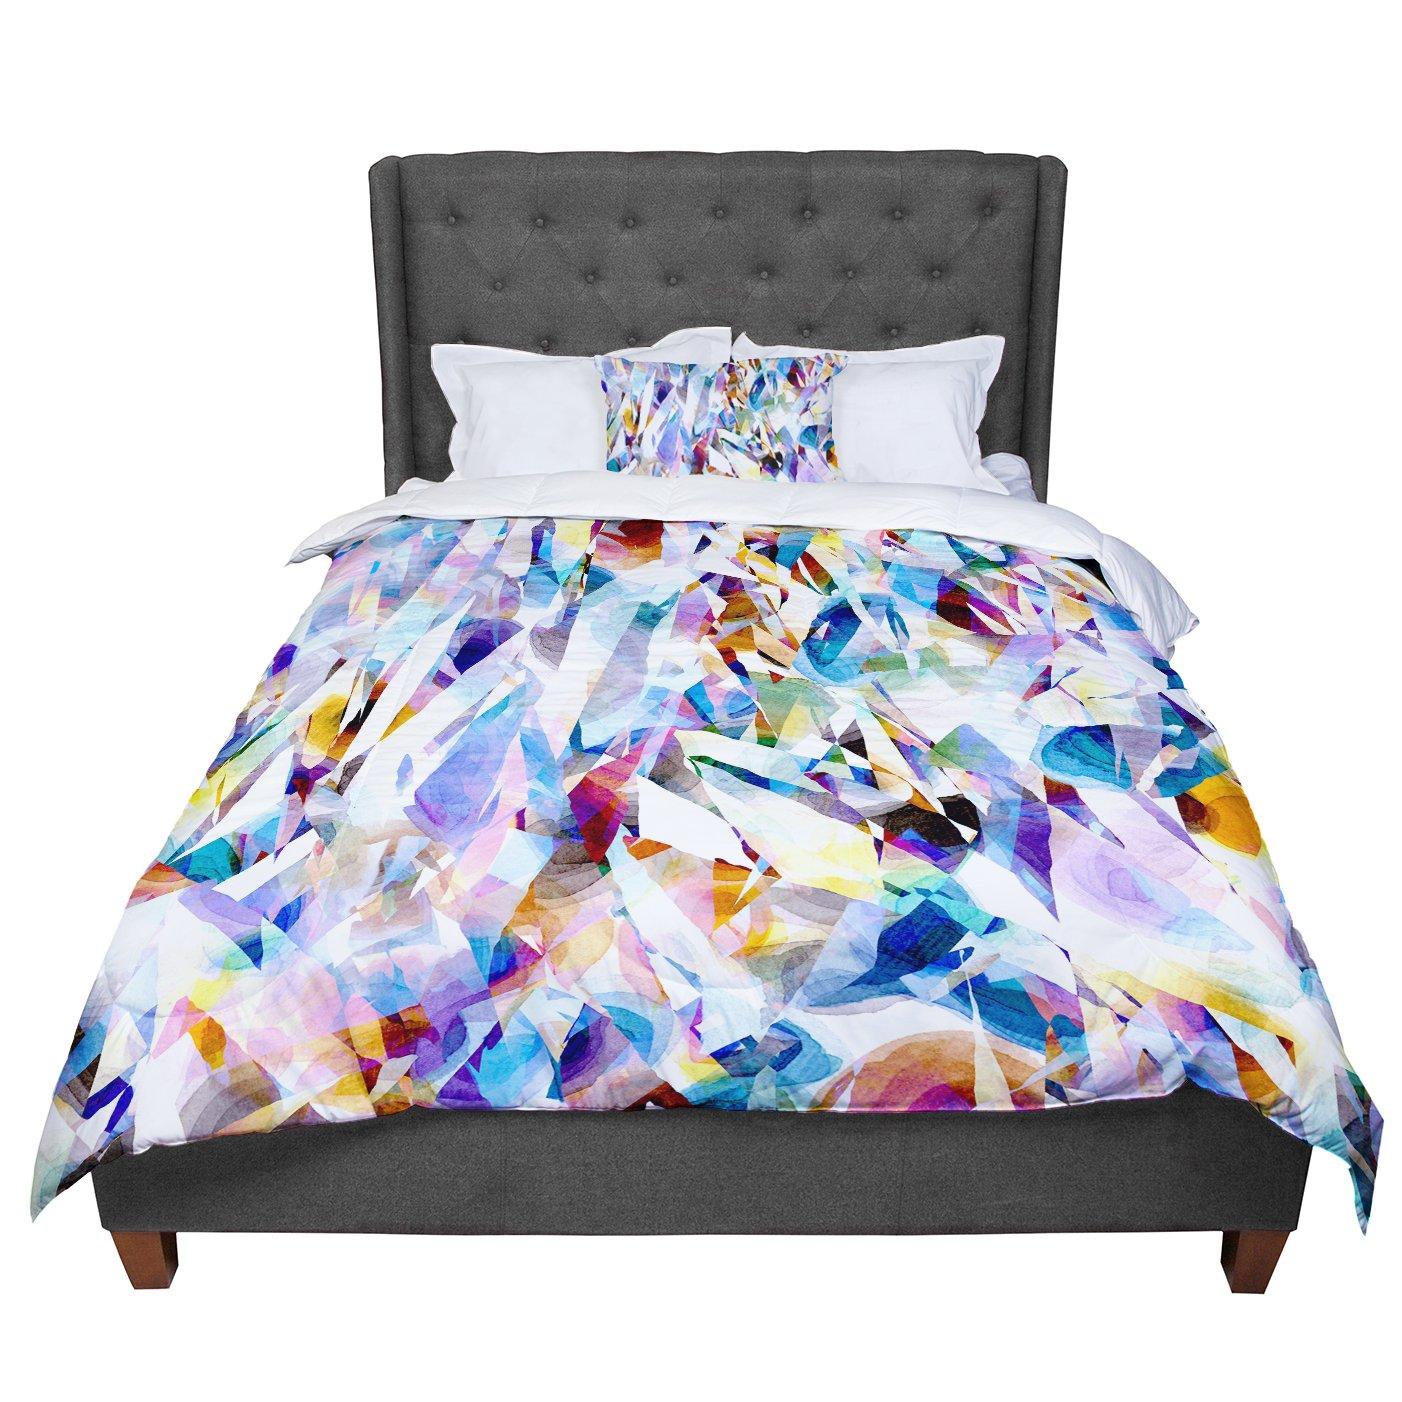 KESS InHouse Gabriela Fuente \'Buzz\' Queen Comforter, 88\' X 88\'